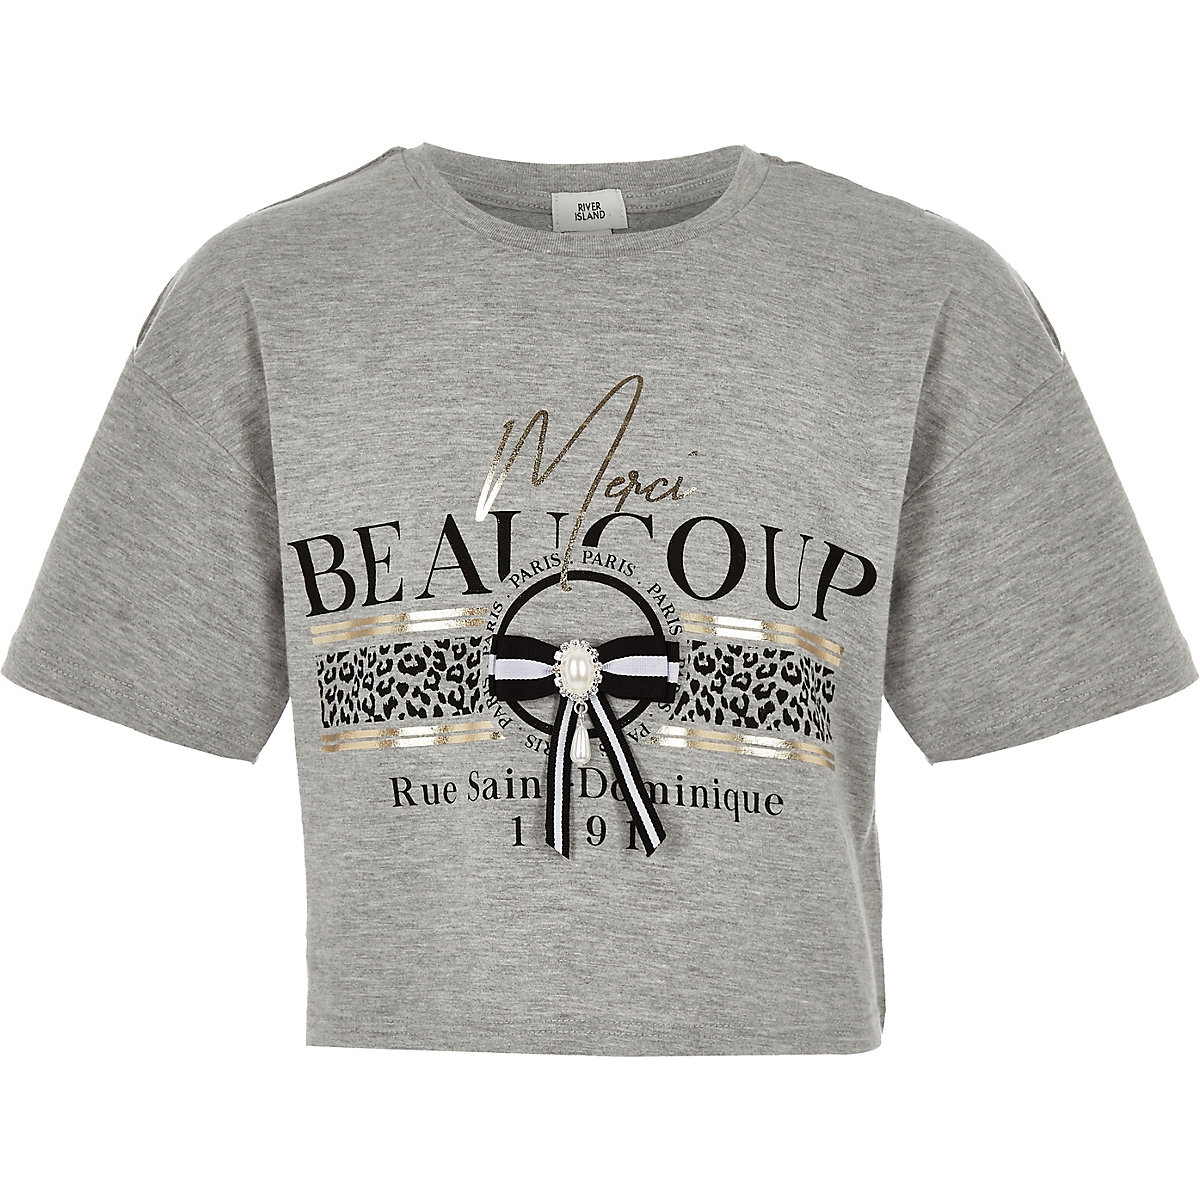 Girls grey 'Merci beaucoup' bow T-shirt